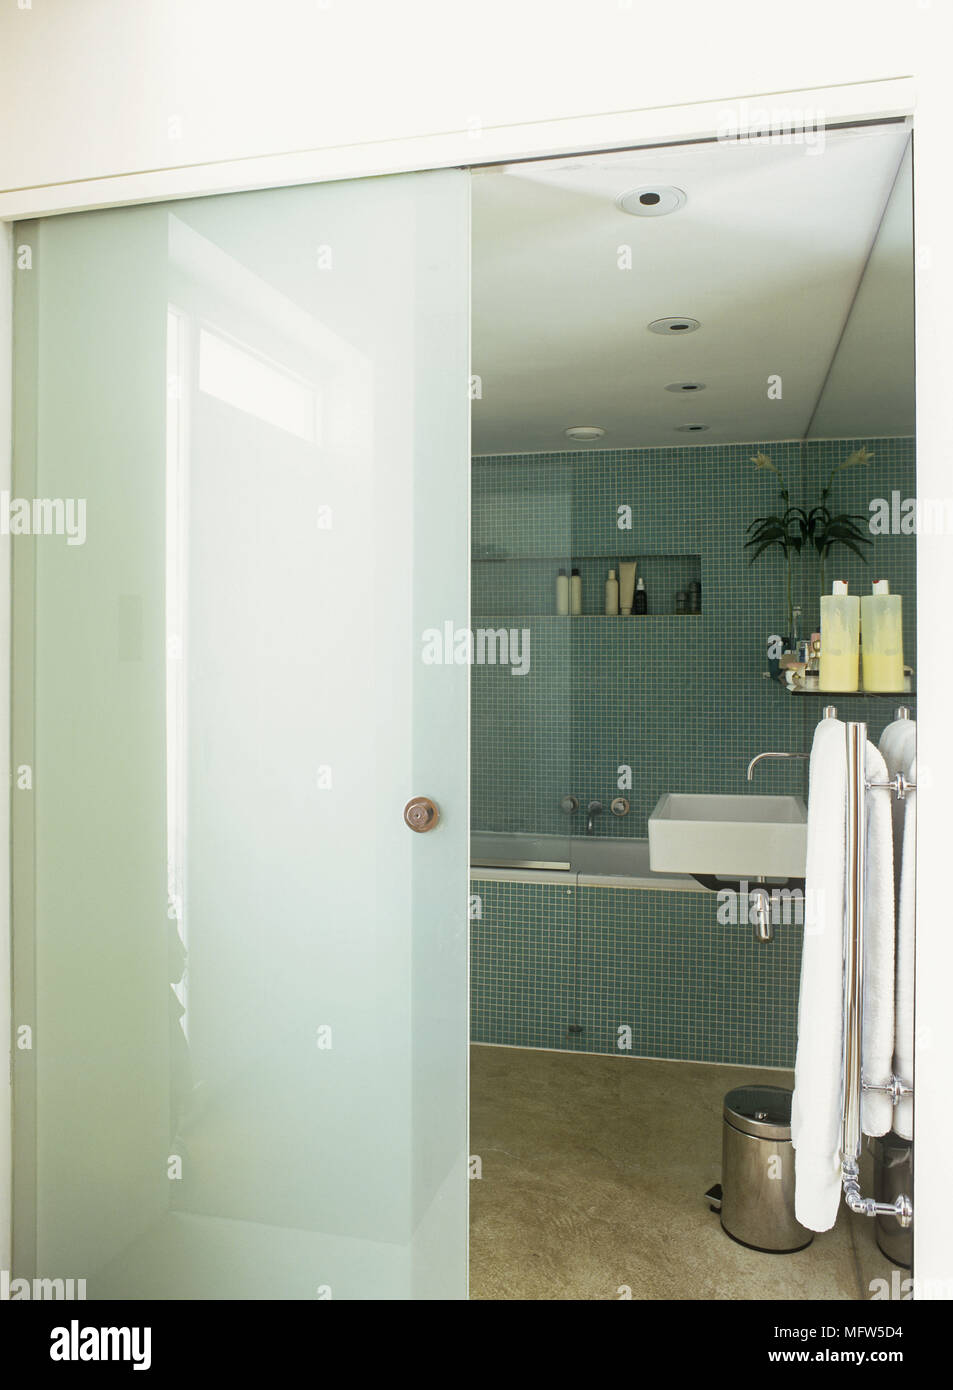 View Through Sliding Door To Washbasin And Bathtub Stock Photo